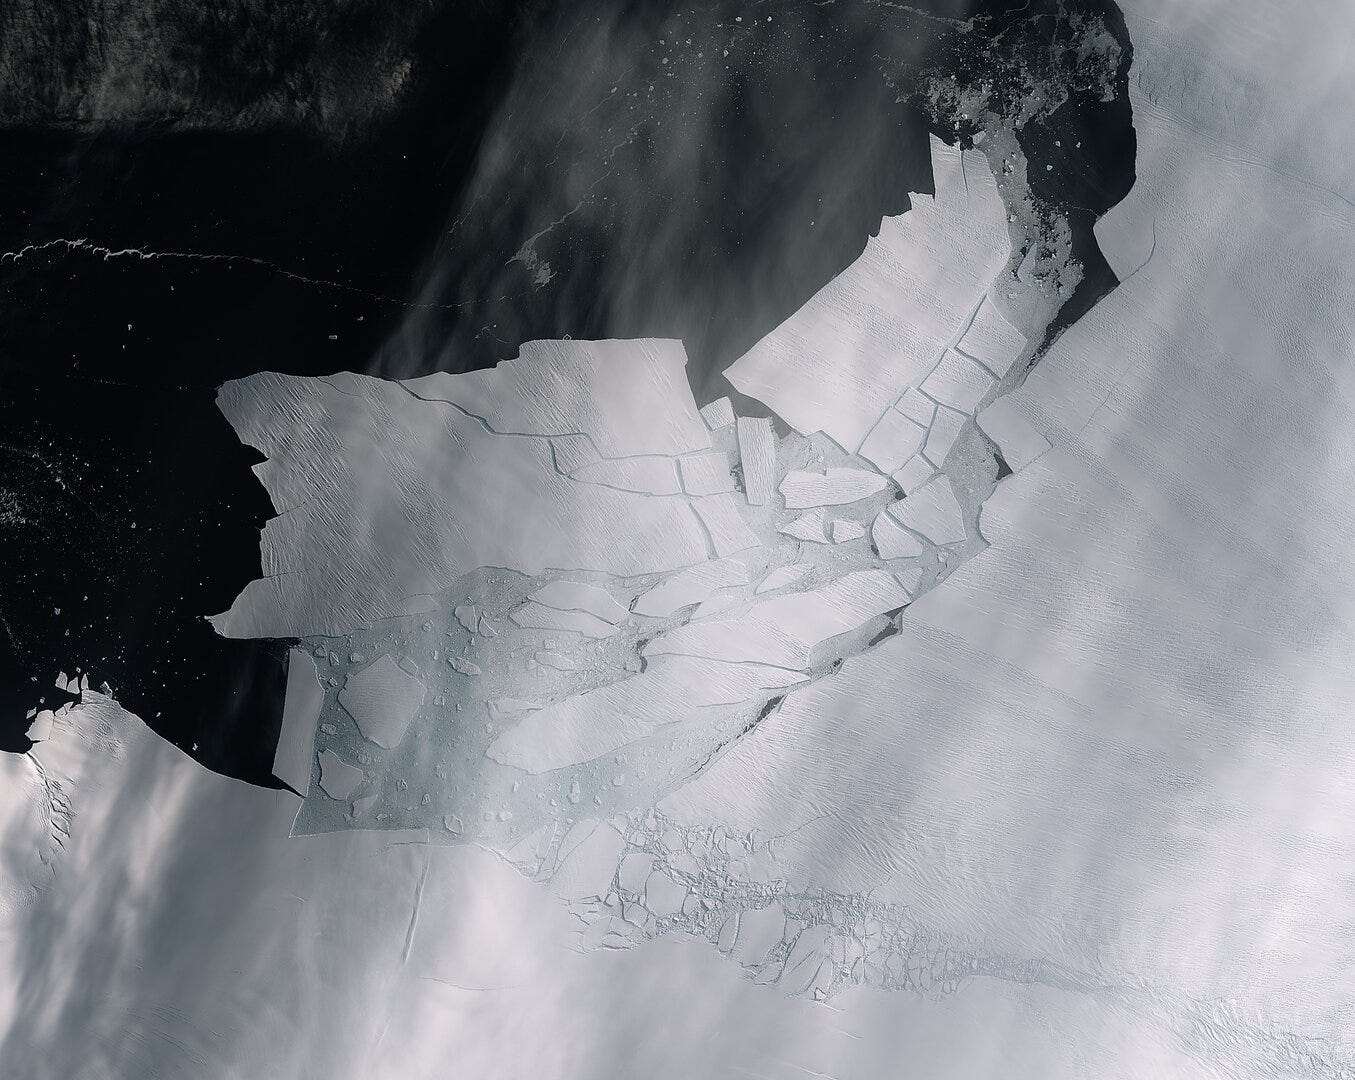 Iceberg twice the size of Washington, D.C., breaks off Pine Island glacier in Antarctica